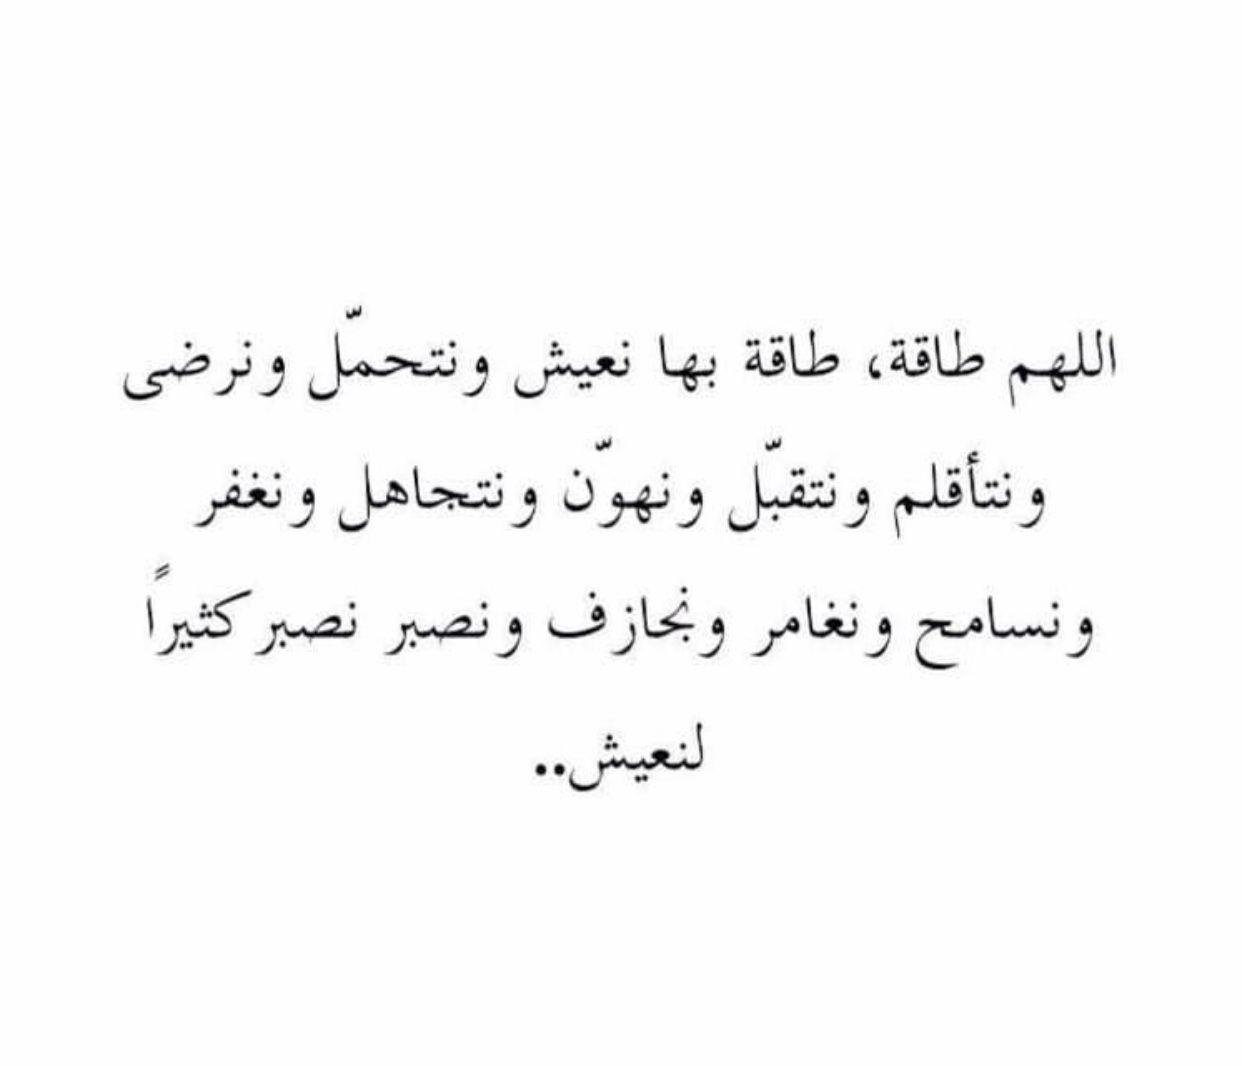 Pin By H On كلام جميل Arabic Calligraphy Calligraphy